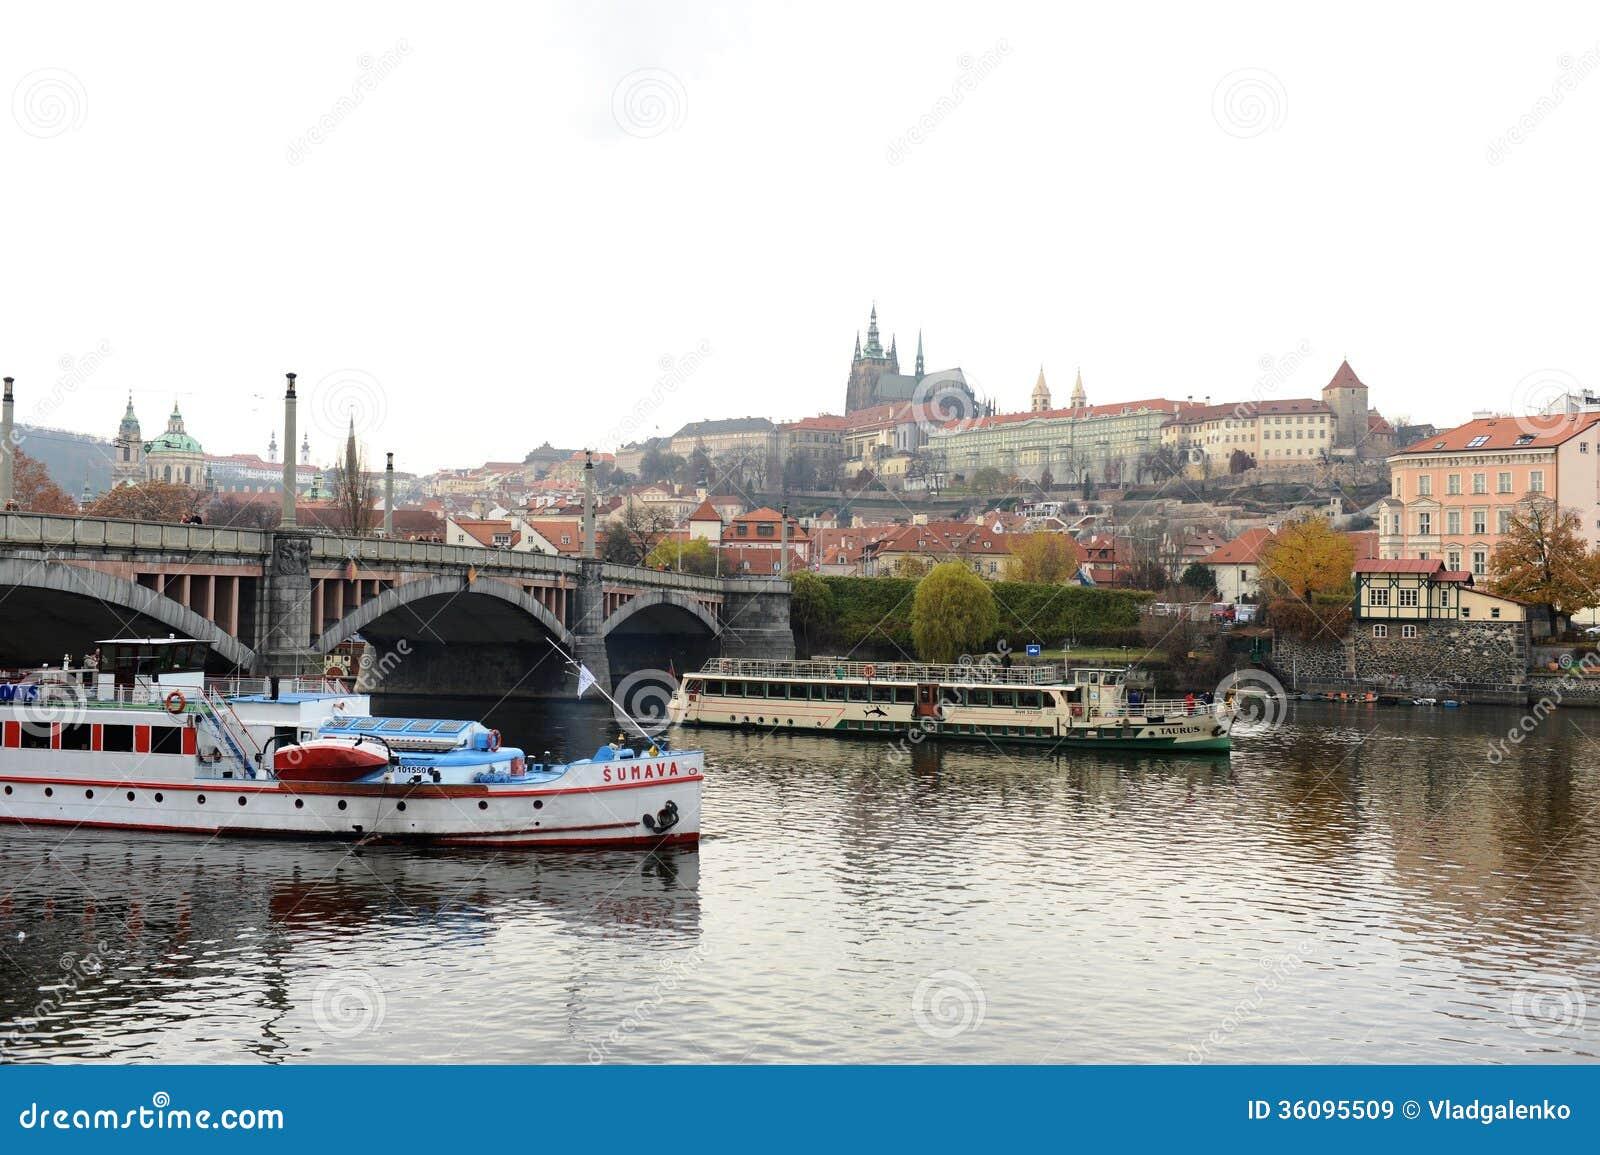 Prague Cultural Center